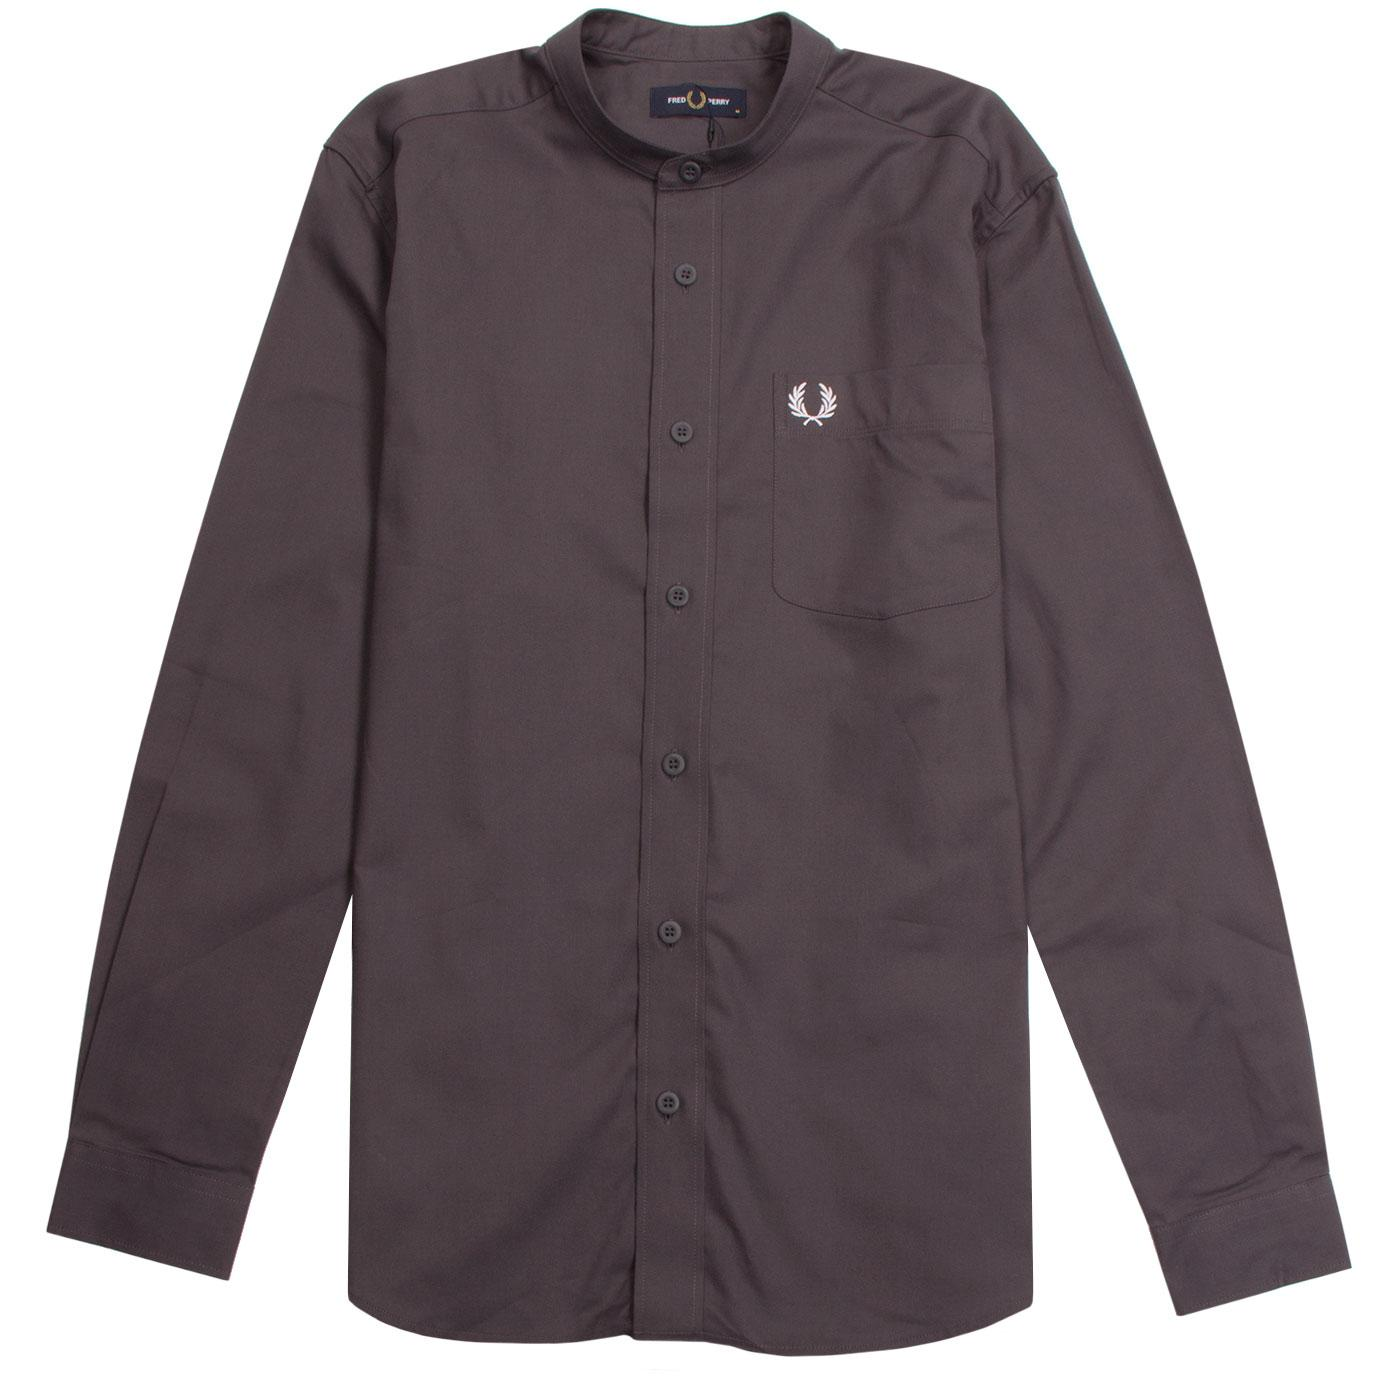 FRED PERRY Retro 60s Grandad Collar Oxford Shirt C